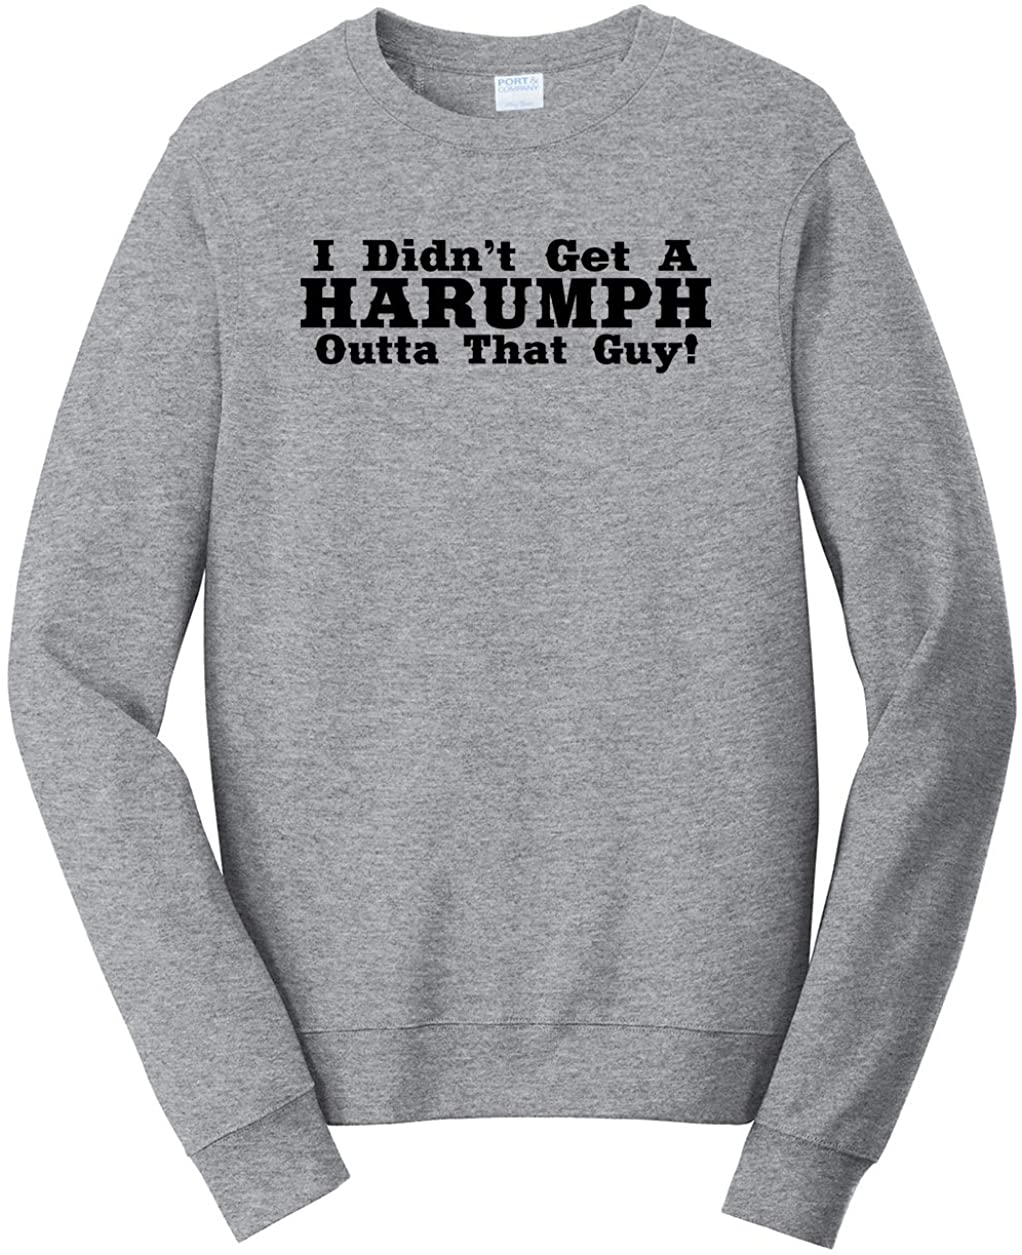 Tenacitee Men's I Didn't Get A Harumph Outta That Guy Sweatshirt